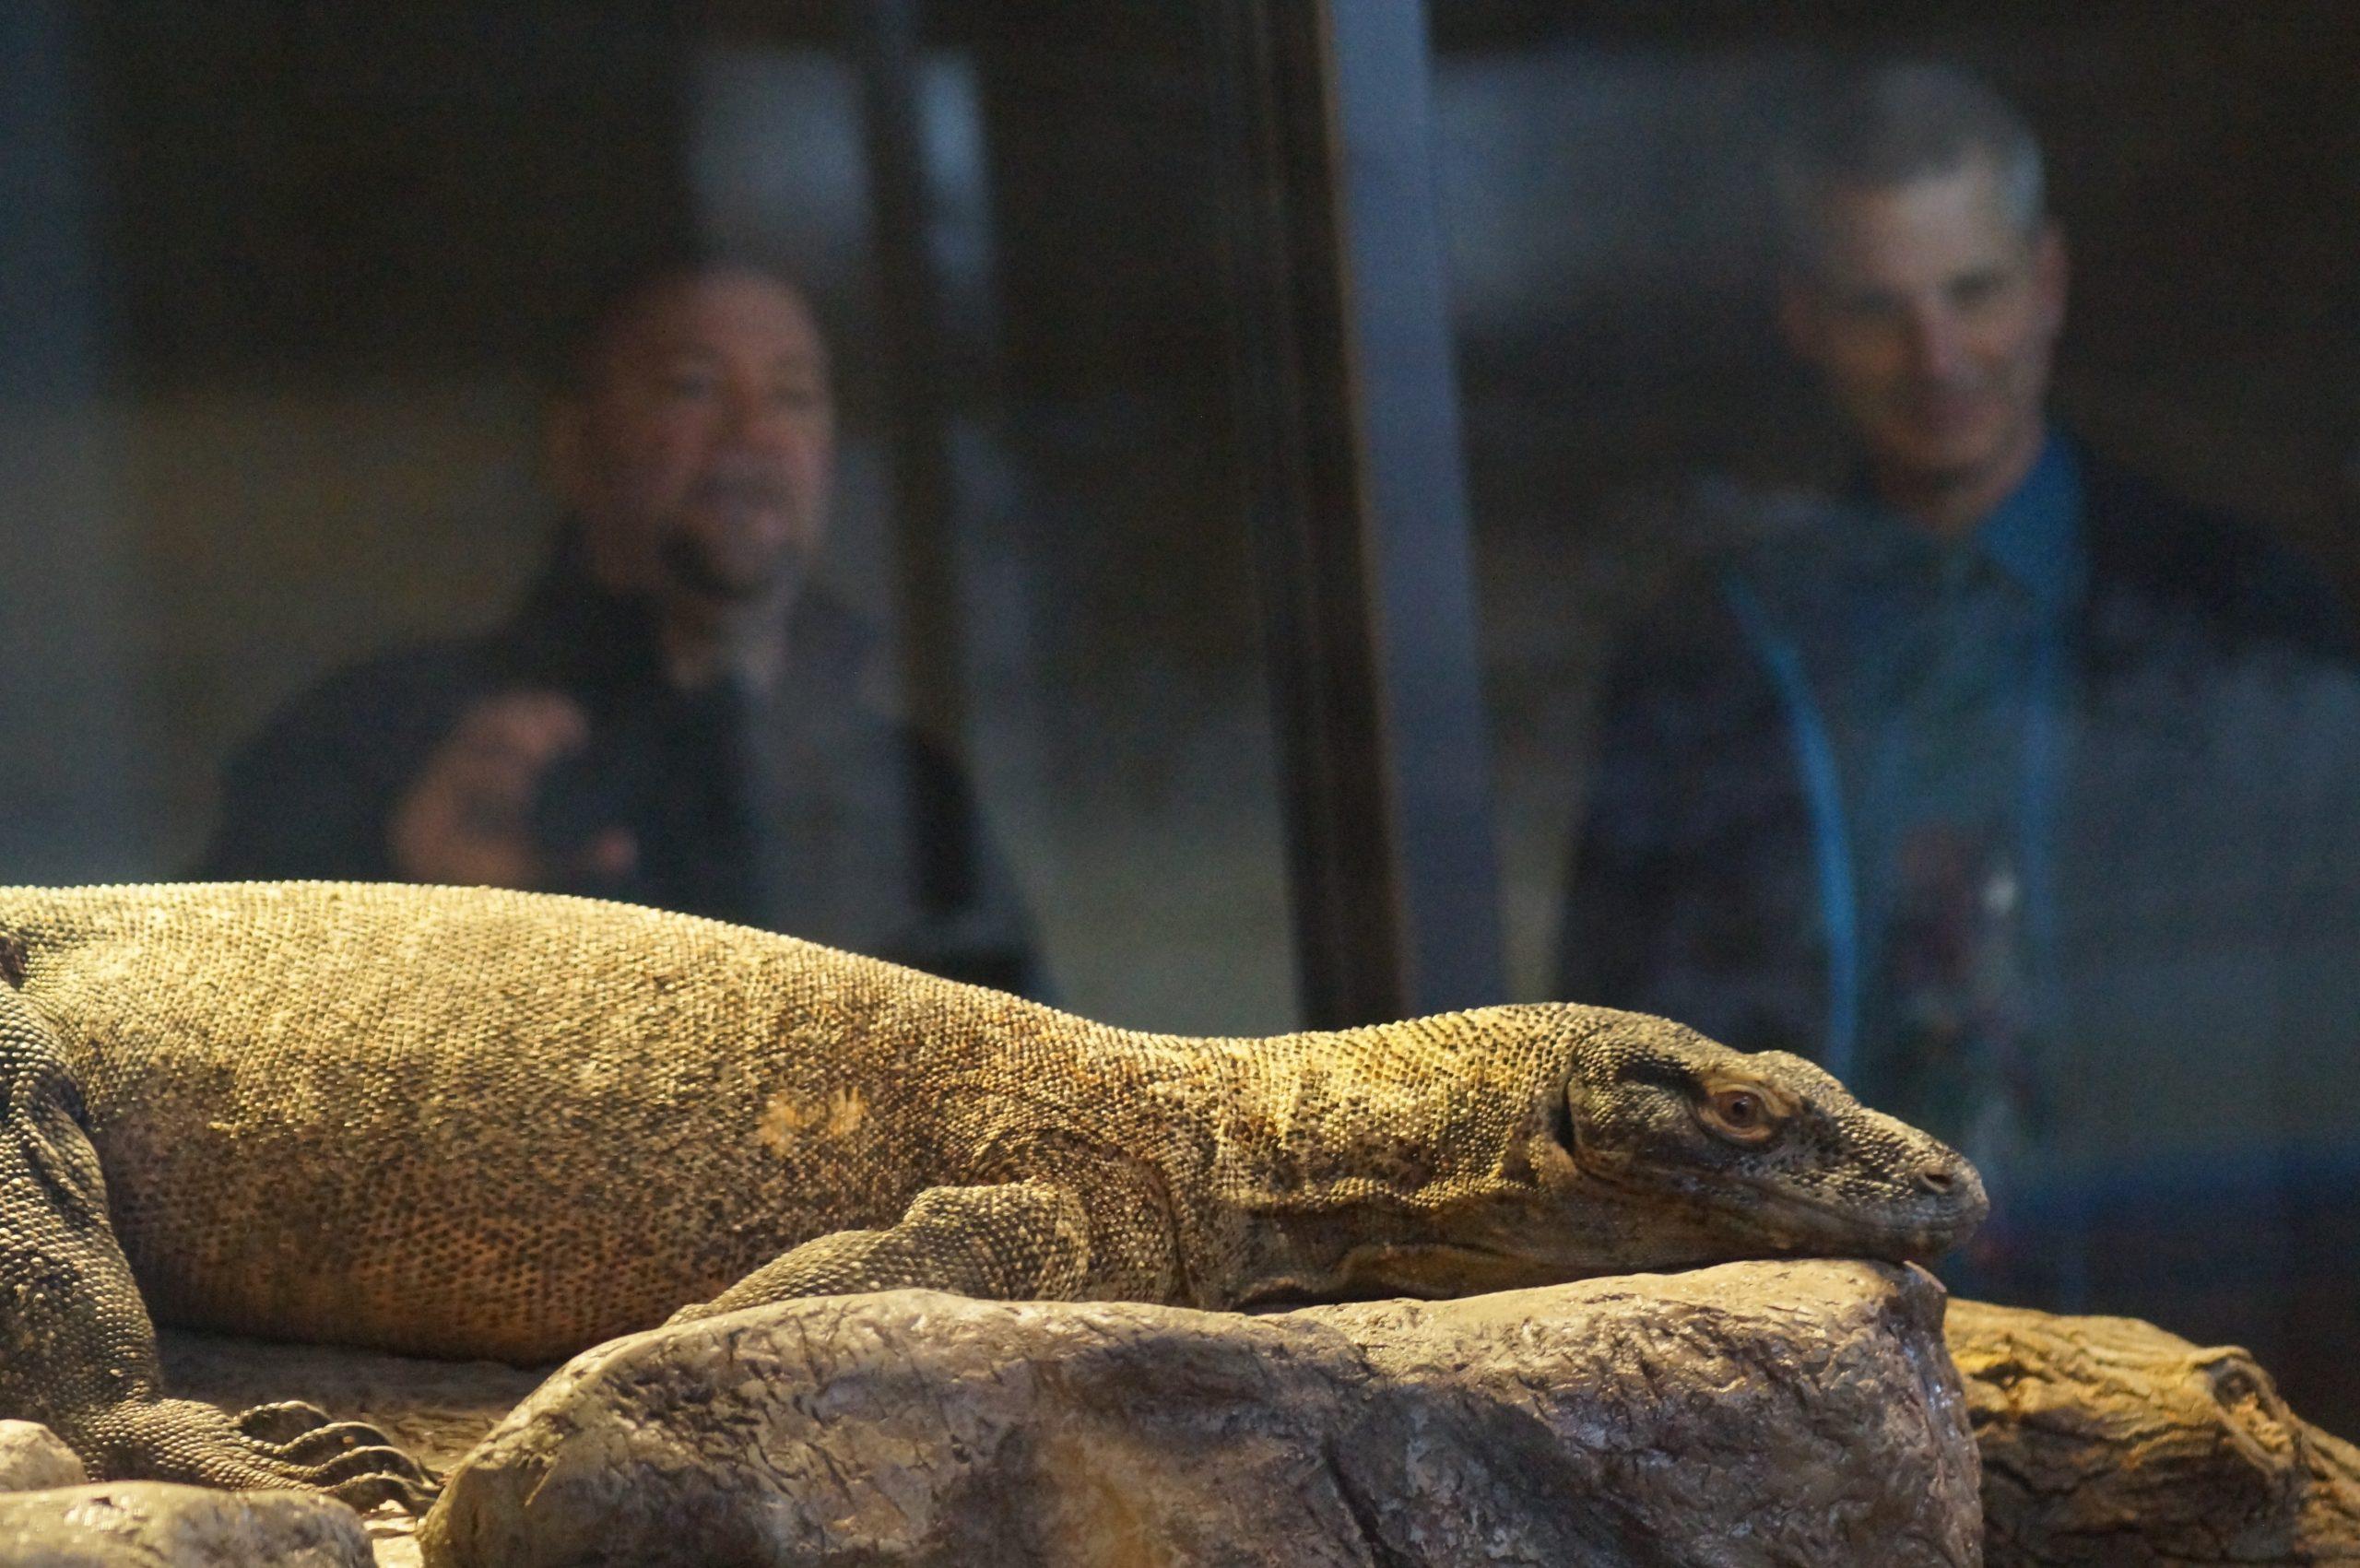 Komodo dragons settle into new home at Saskatoon zoo